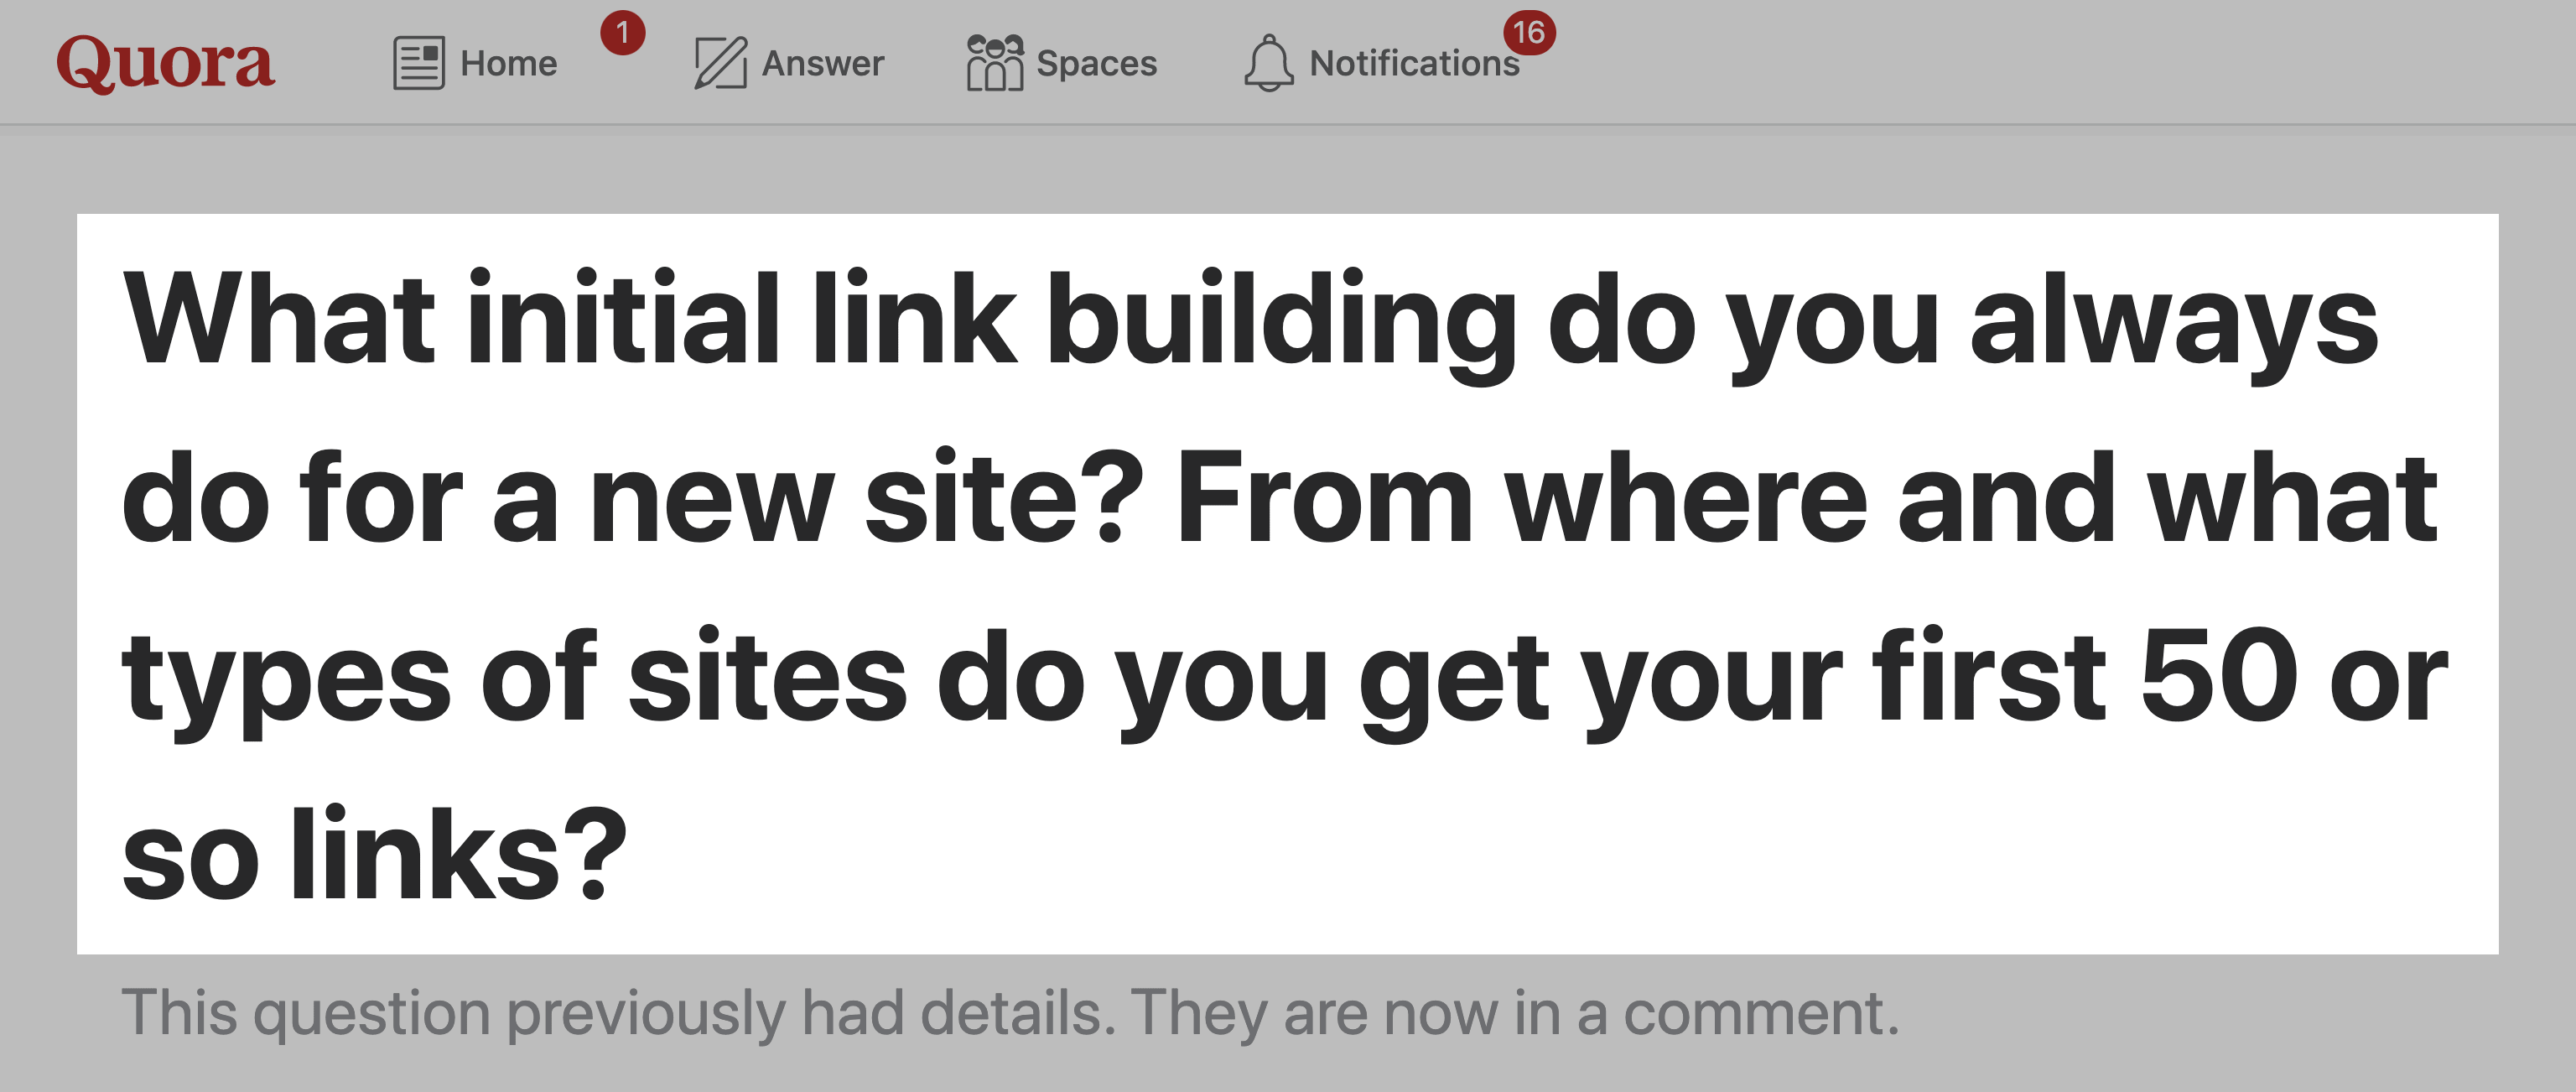 Quora – Initial Link Building Question